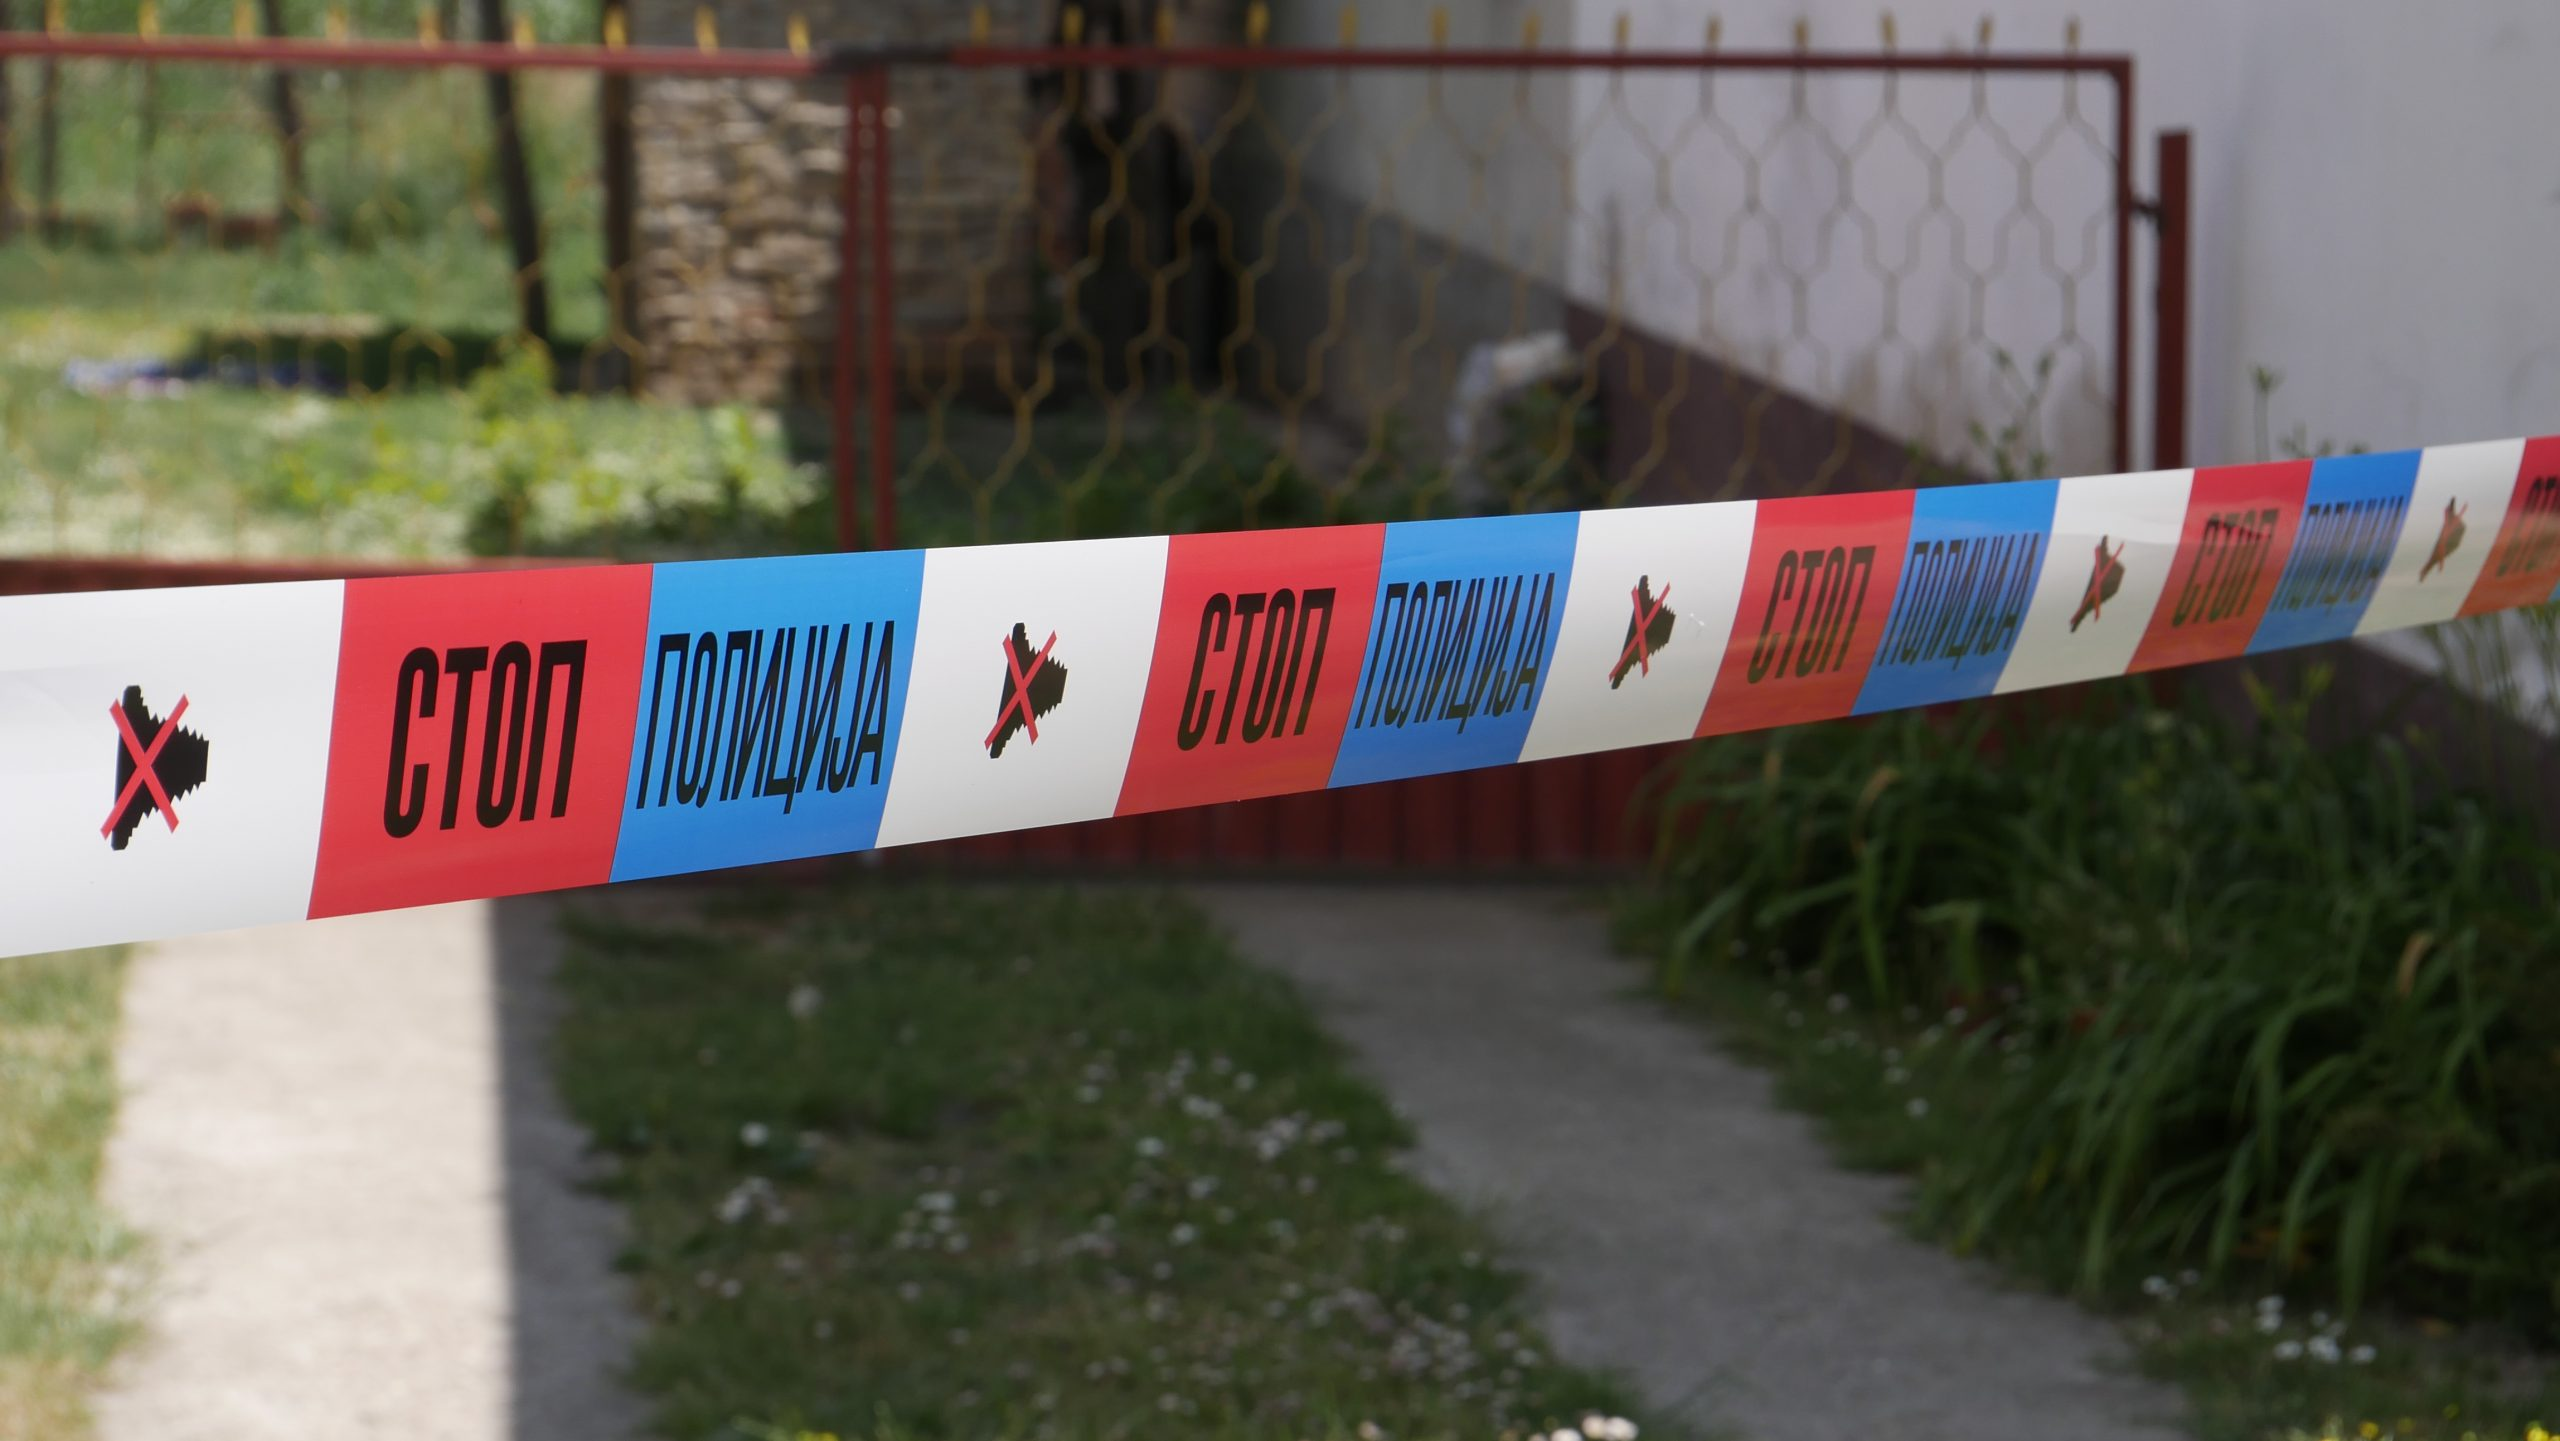 Mesto zlocina policijska traka policija zlocin